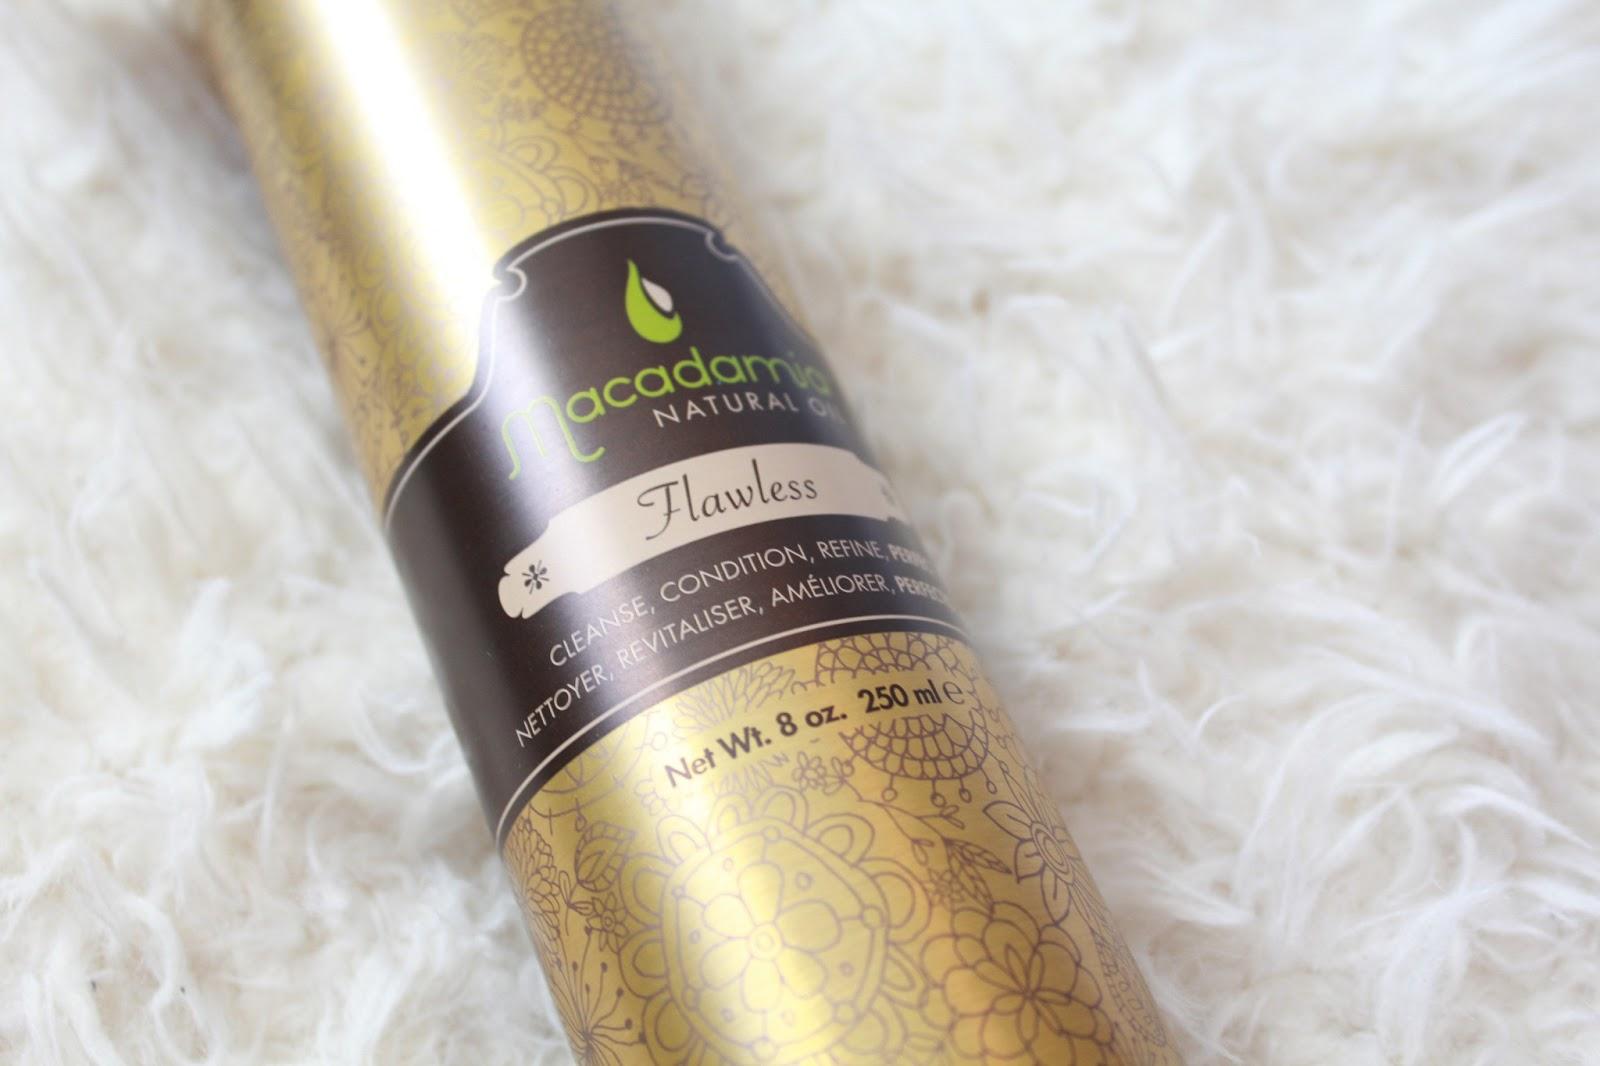 Macadamia Natural Oil Flawless